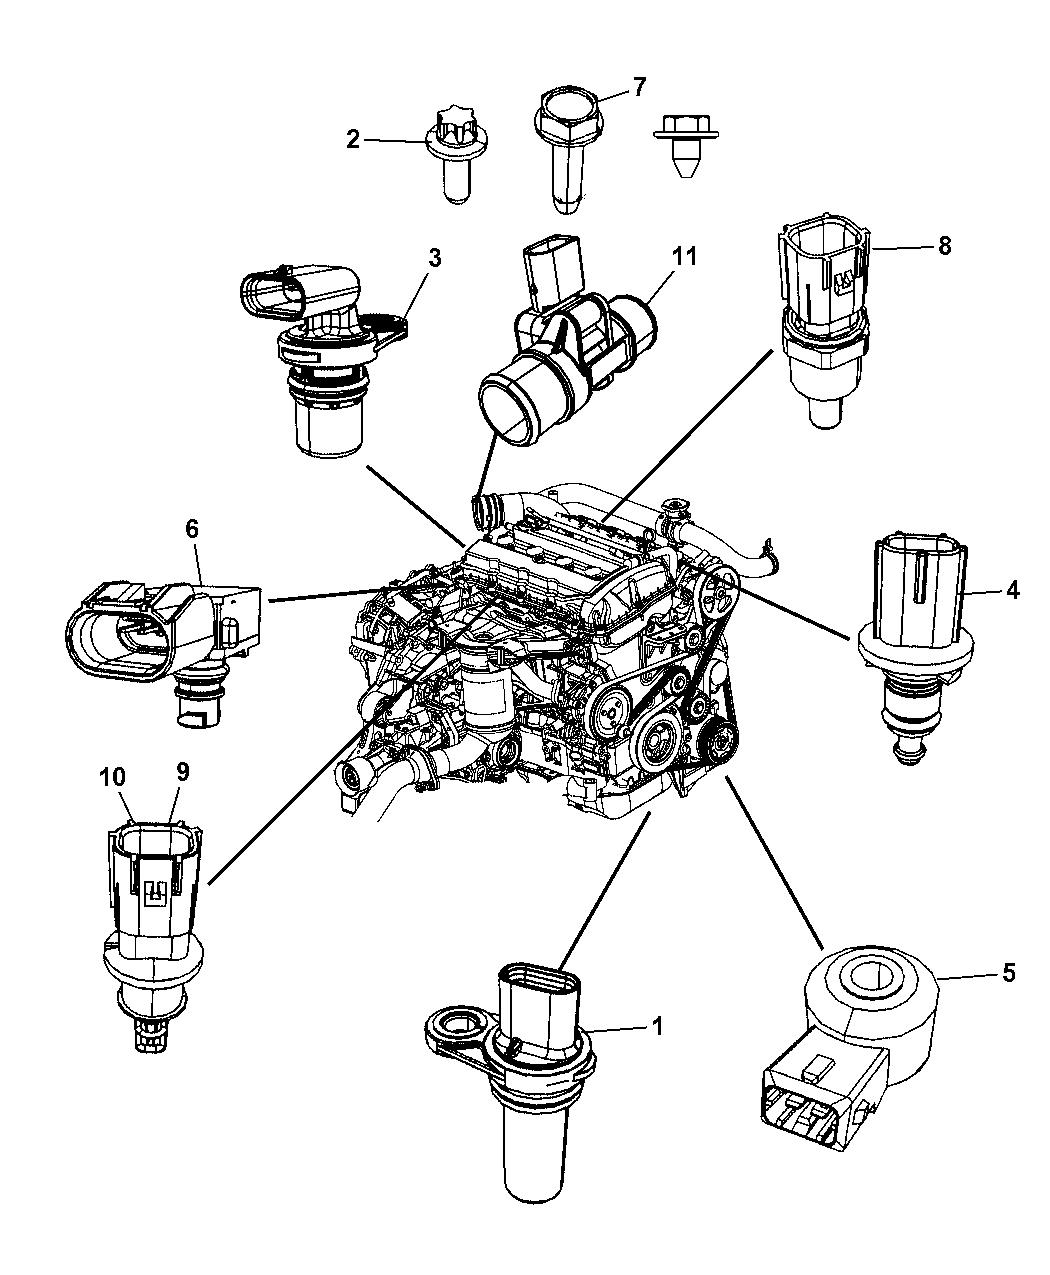 2009 Dodge Caliber Sensors - Engine - Mopar Parts Giant